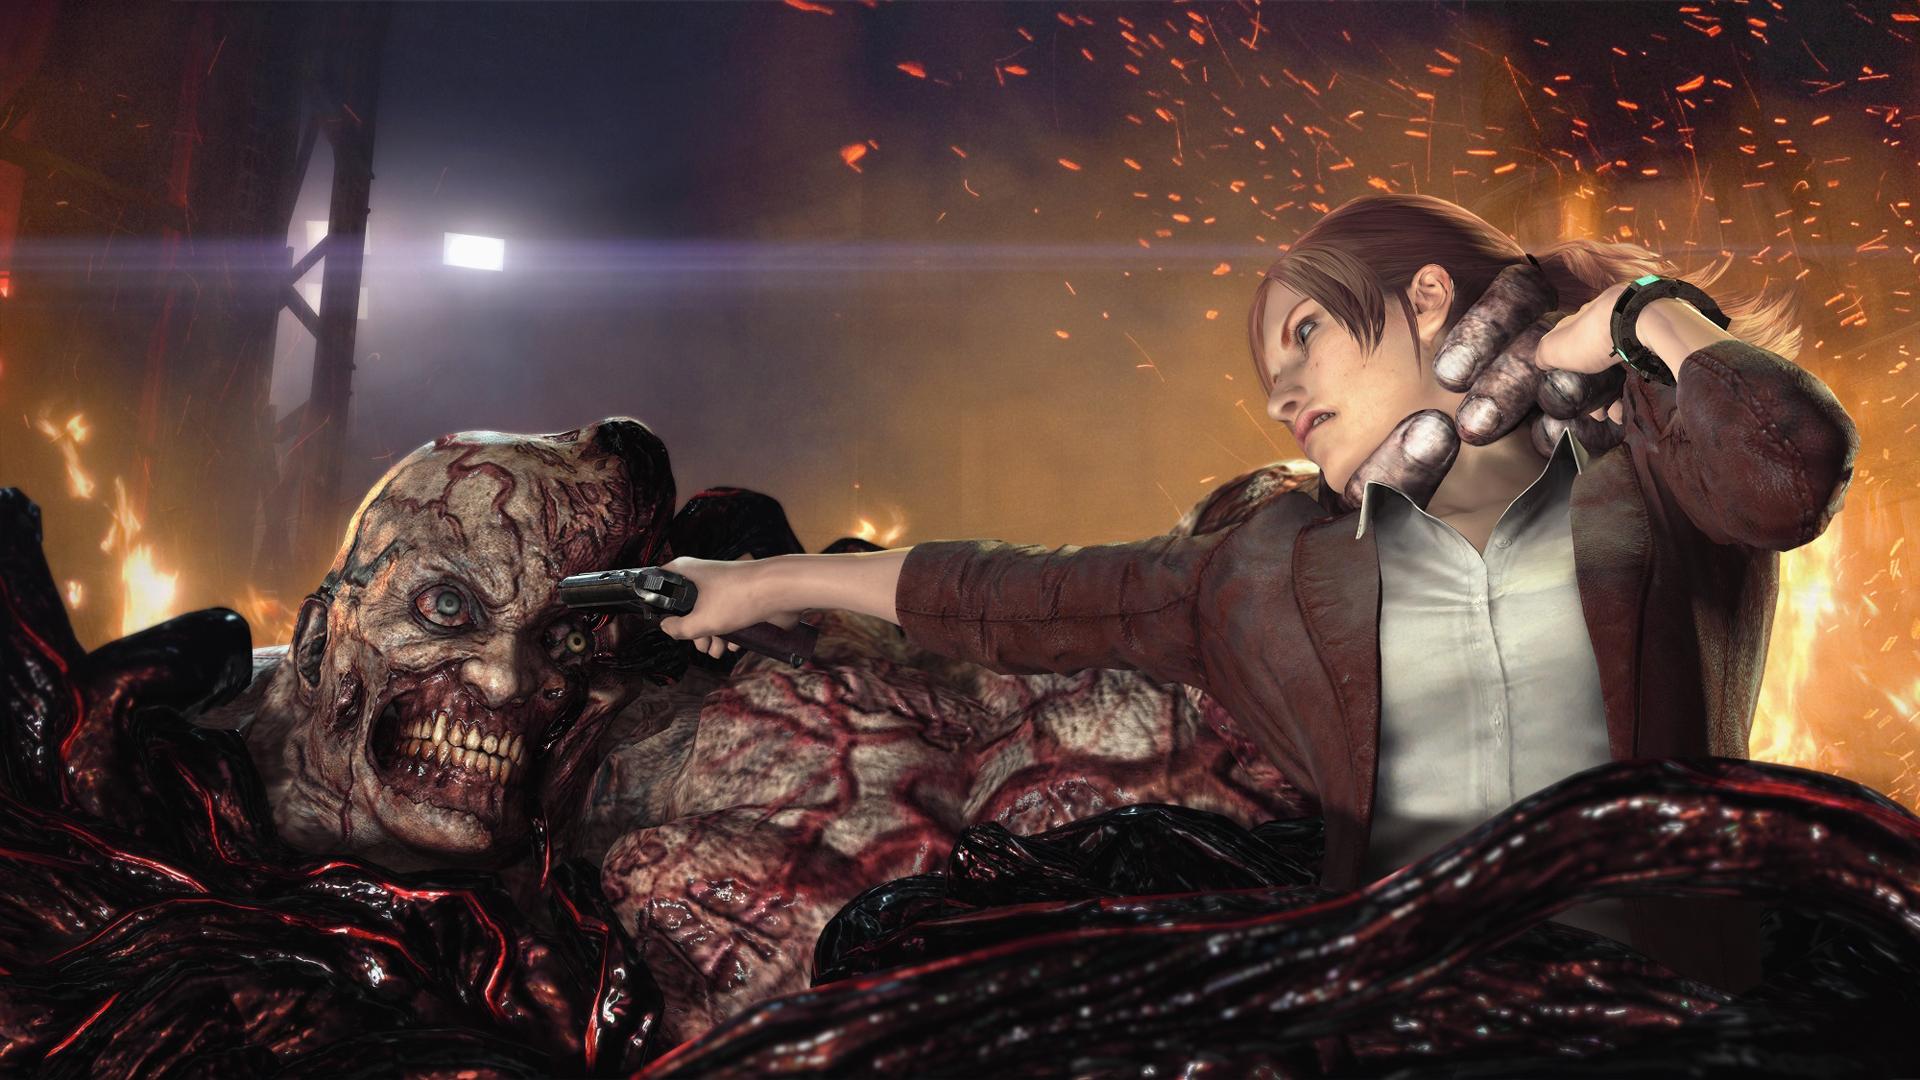 Claire kontra Nemesis Wallpaper from Resident Evil Revelations 2 1920x1080